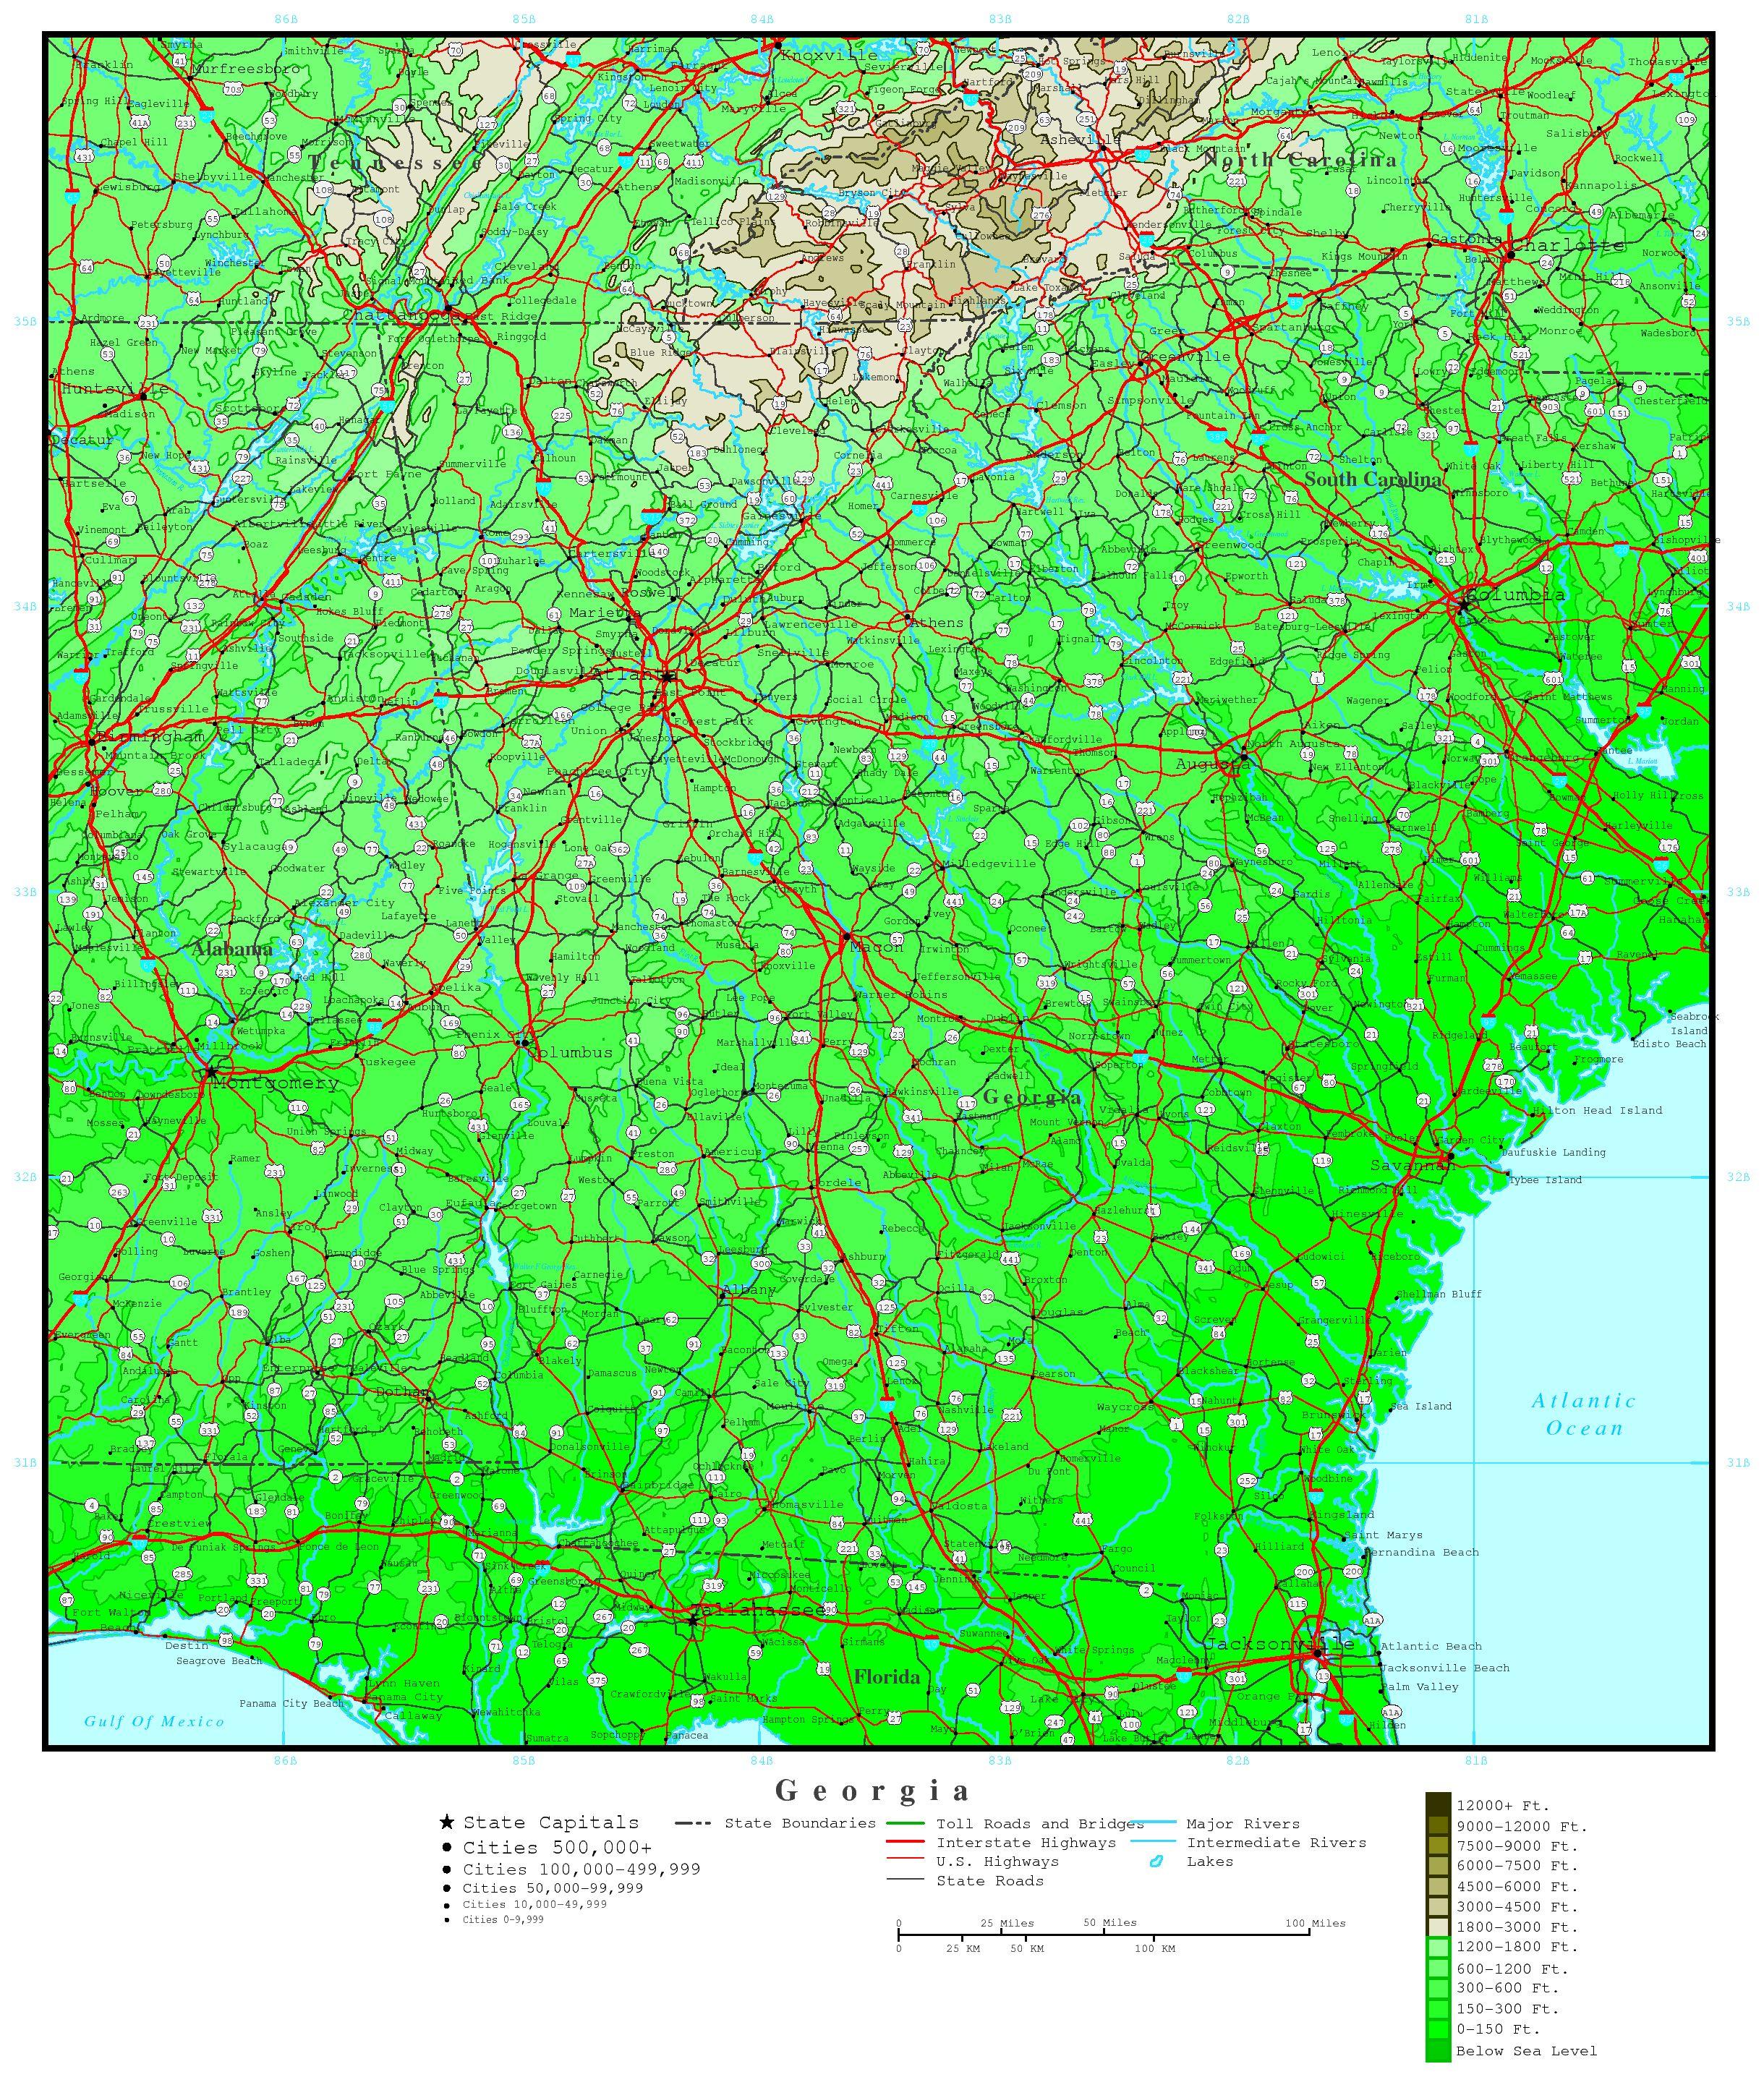 Georgia Elevation Map Georgia Elevation Map